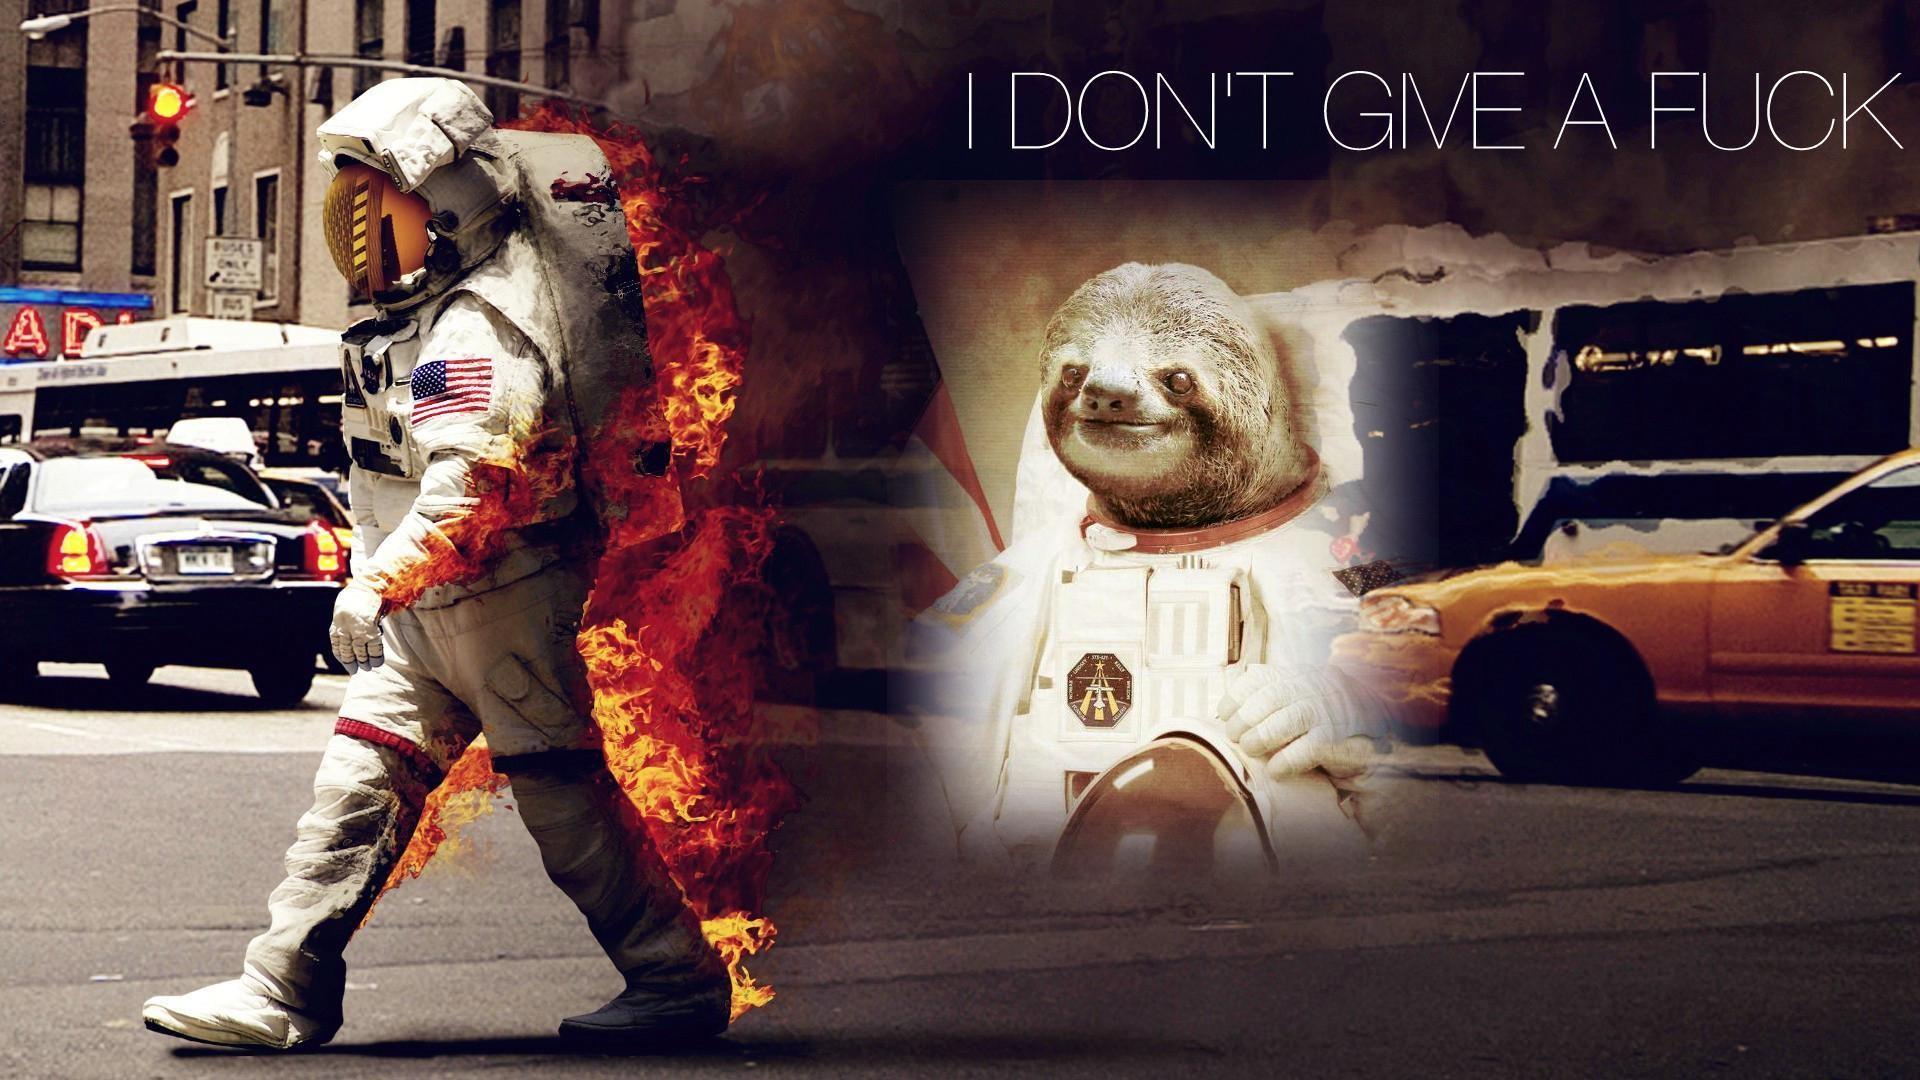 [Image – 437694] | Astronaut Sloth | Know Your Meme